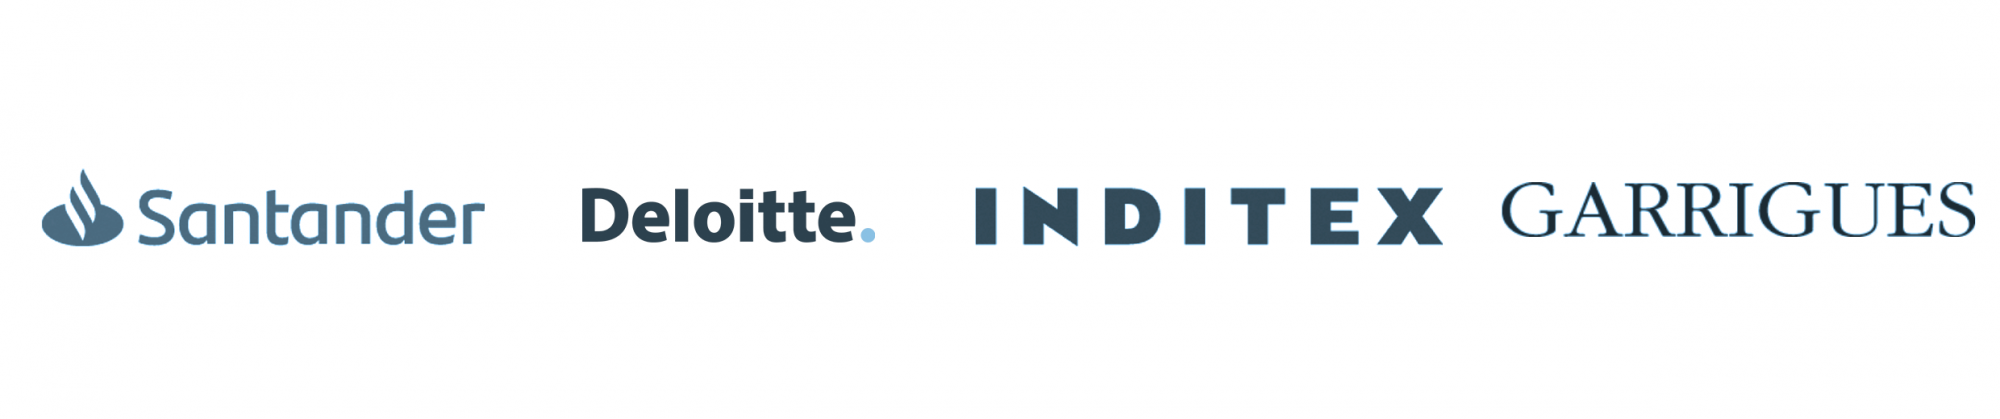 Logos Empresas Azul I